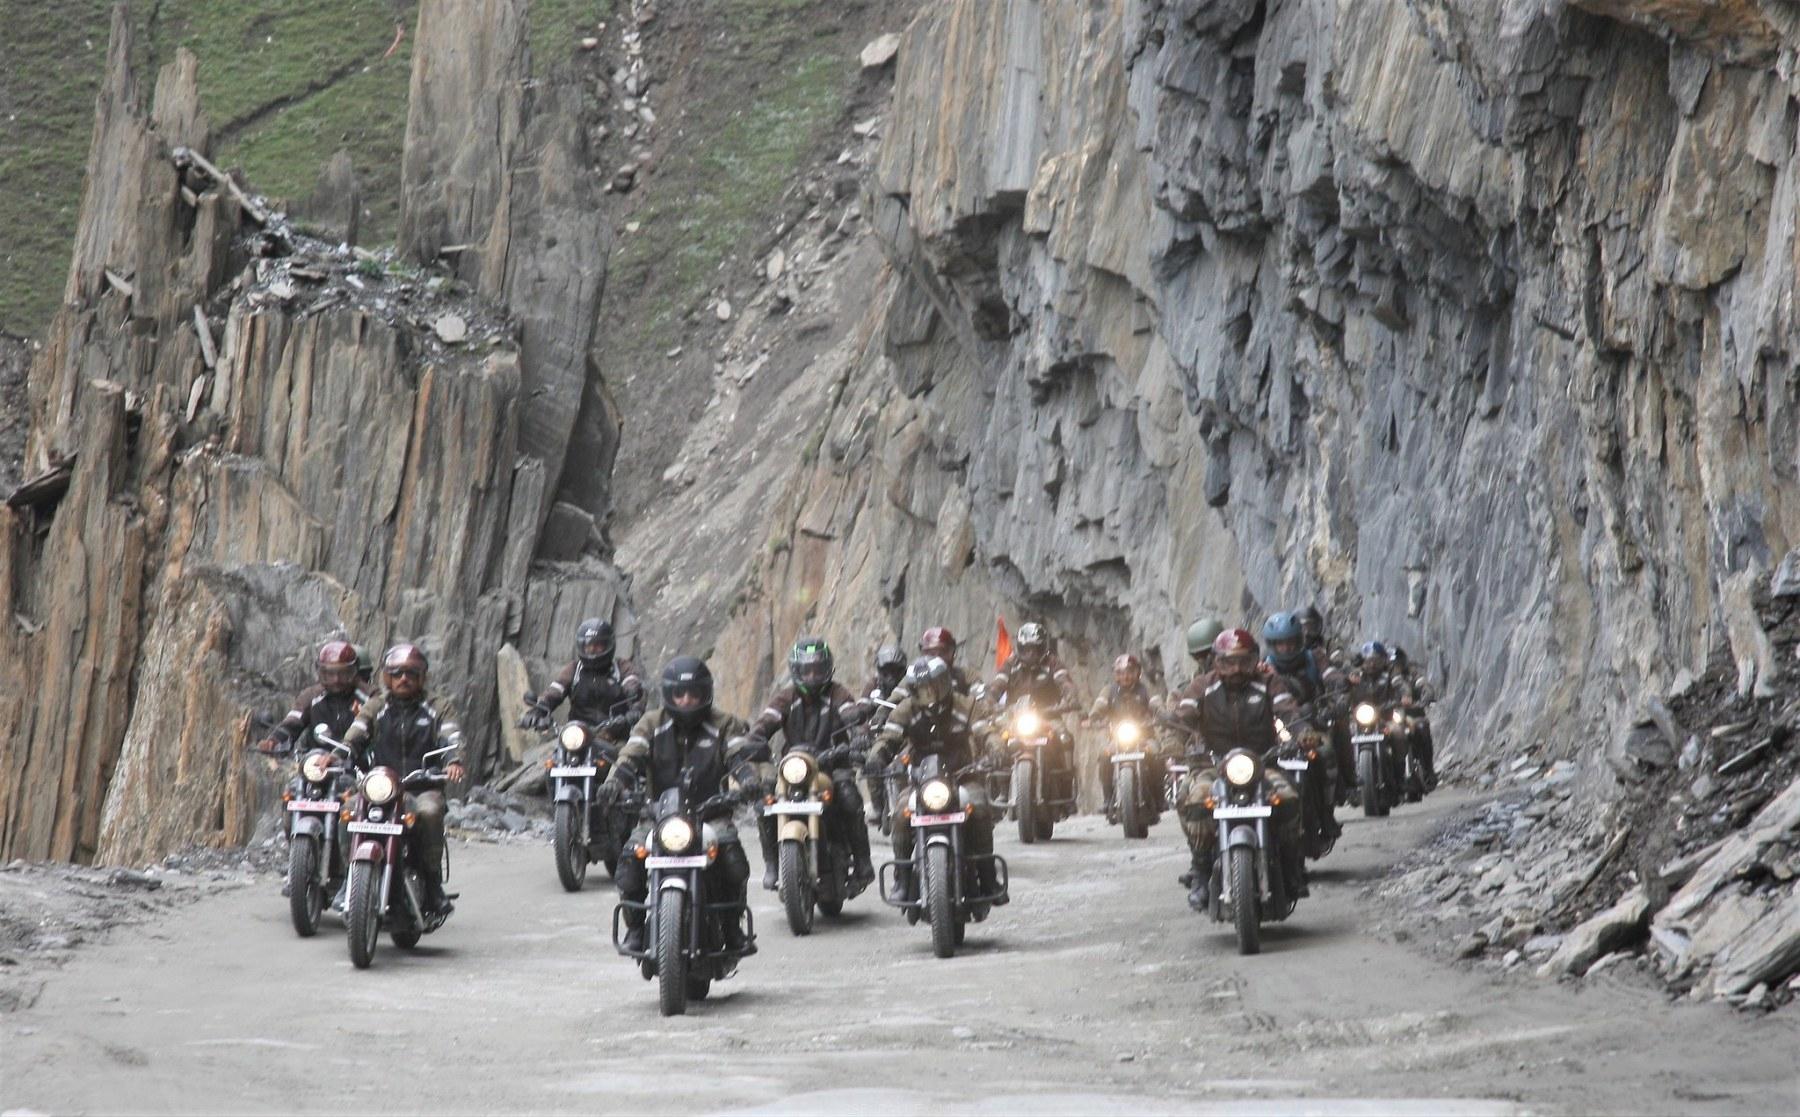 Indian Army Dhruva Kargil Bike Ride On Kargil Vijay Diwas - 1